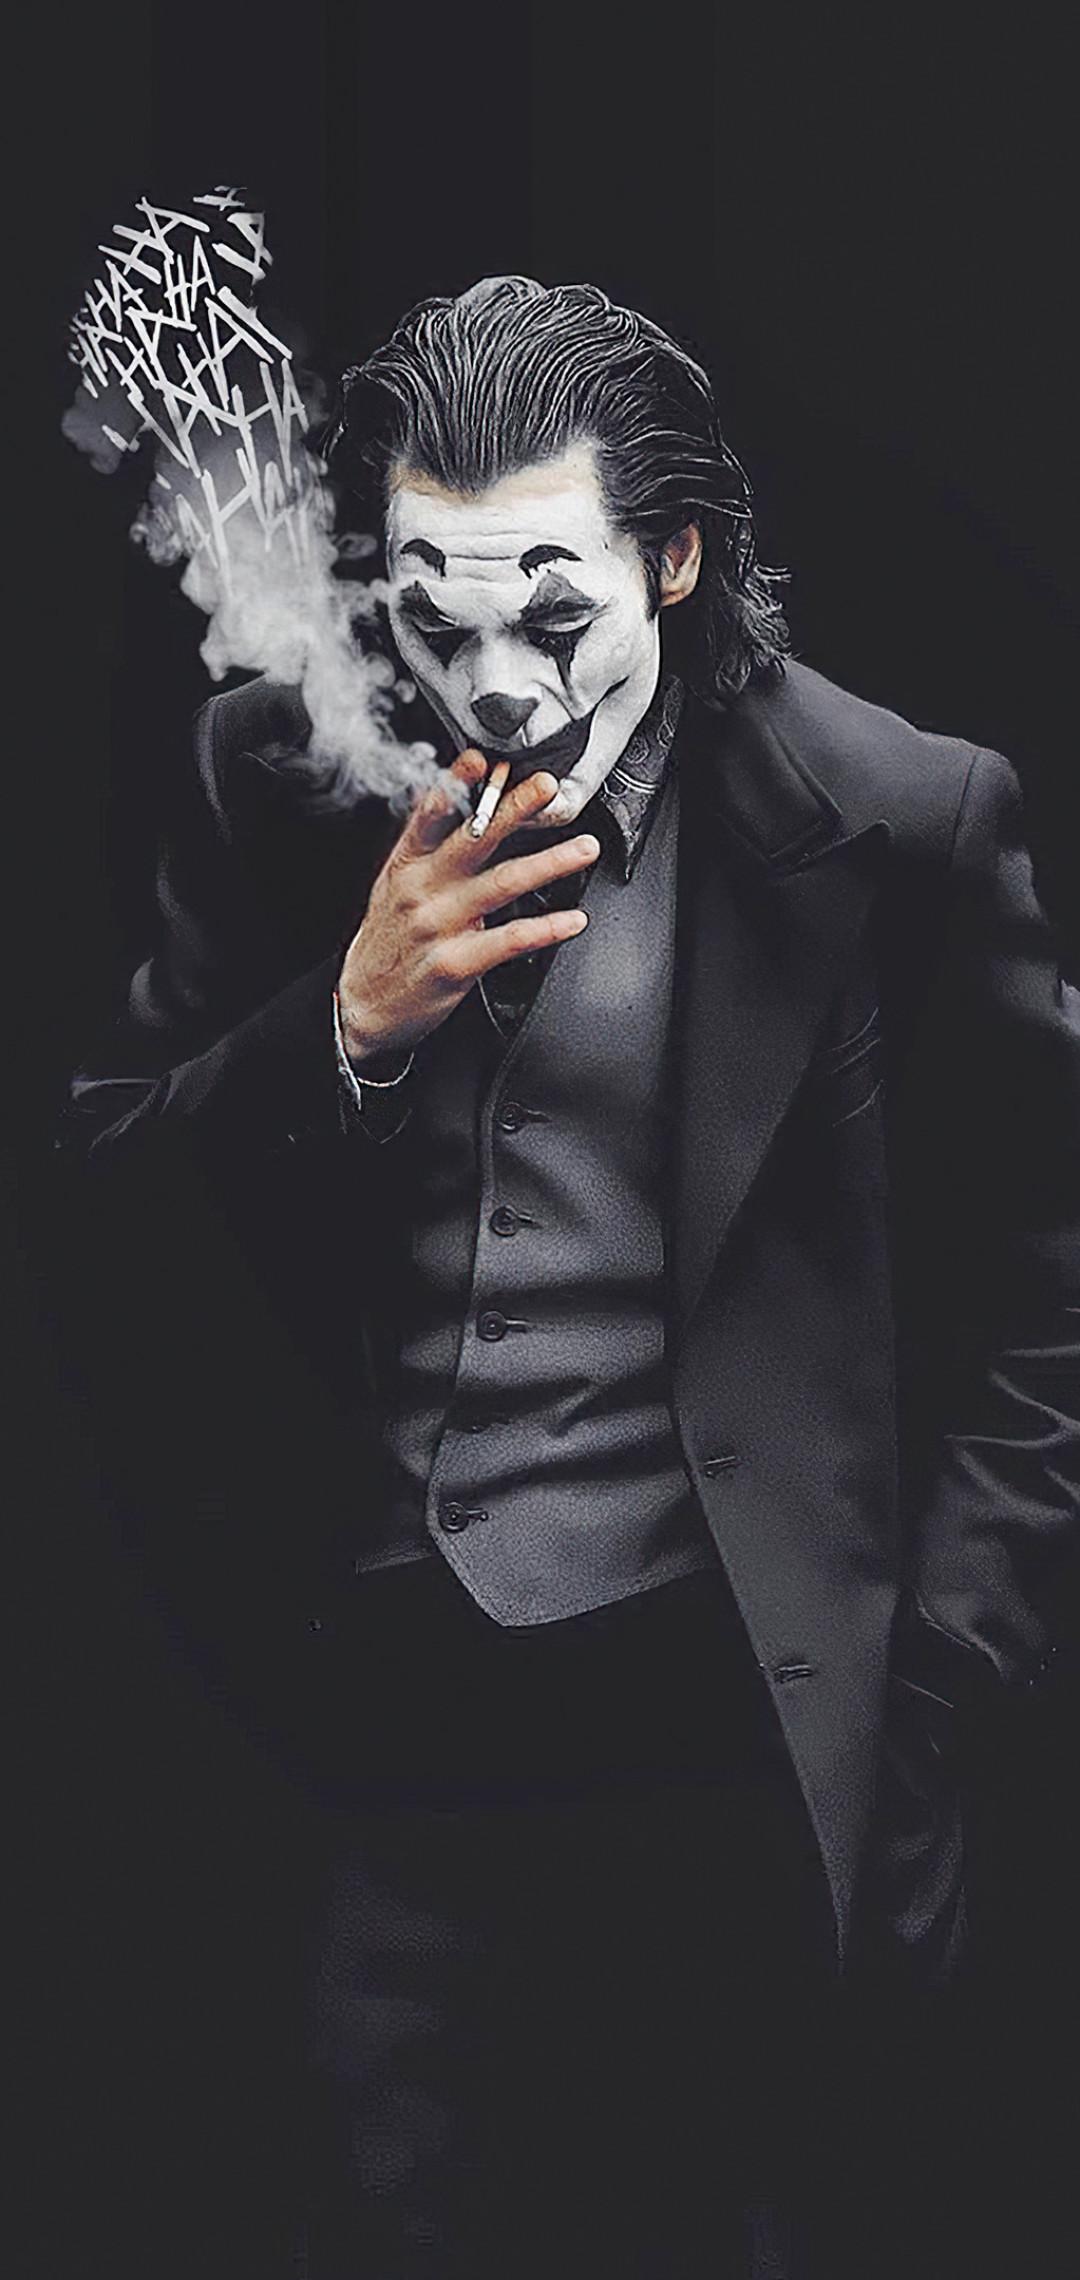 85 ᐈ Joker Wallpapers Download Top Joker Wallpaper For Free Hd